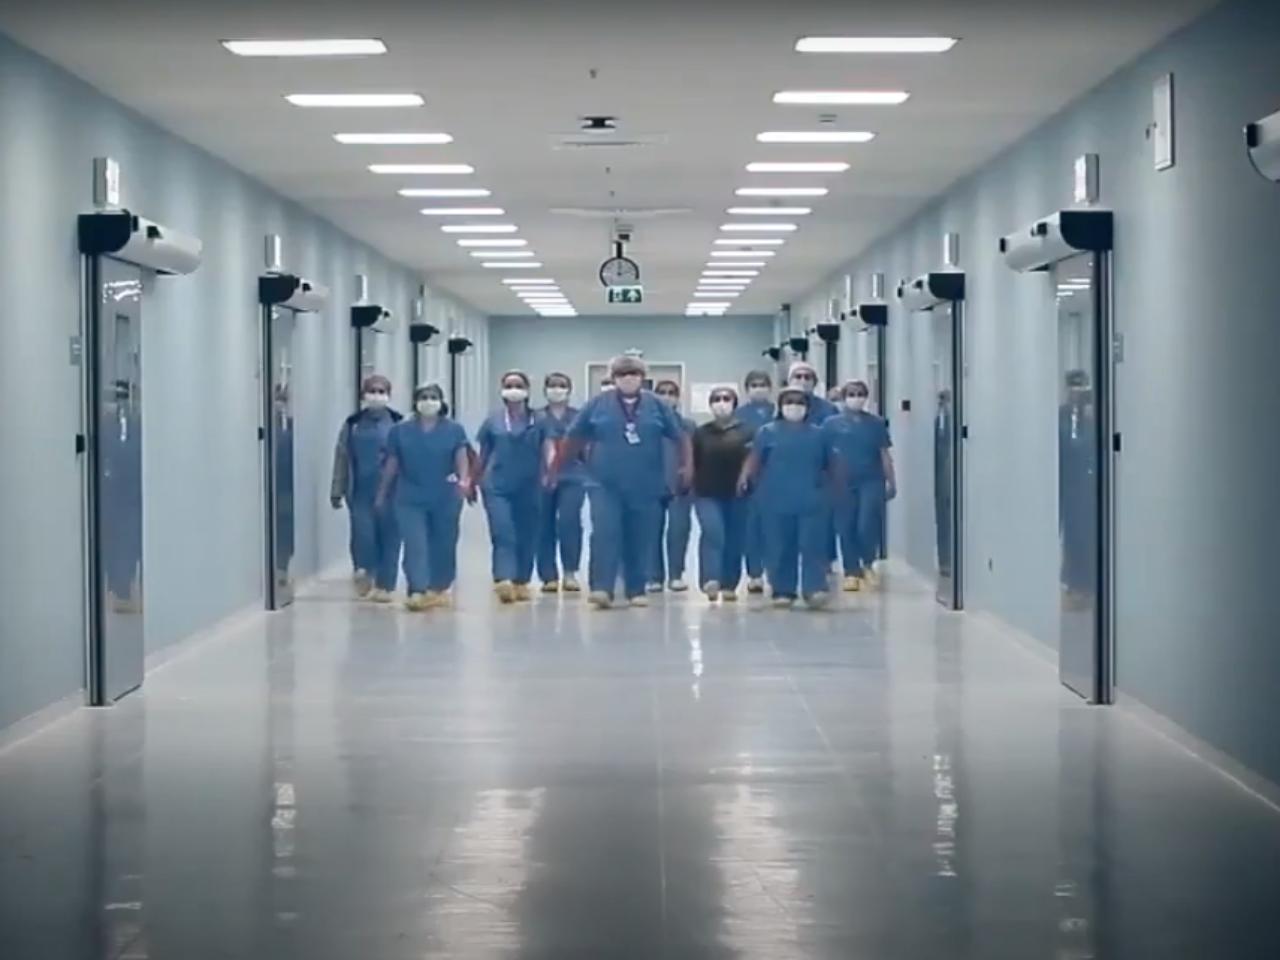 Istanbul Kartal Dr. Lutfi Kırdar City Hospital has opened!